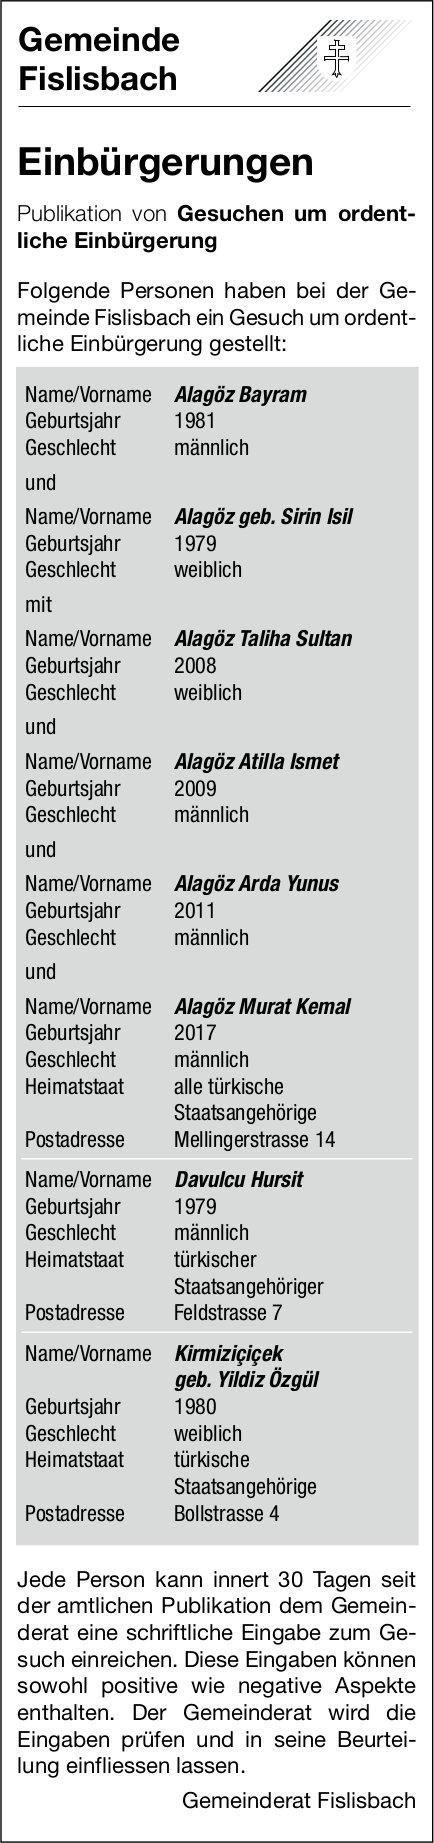 Fislisbach - Einbürgerungen